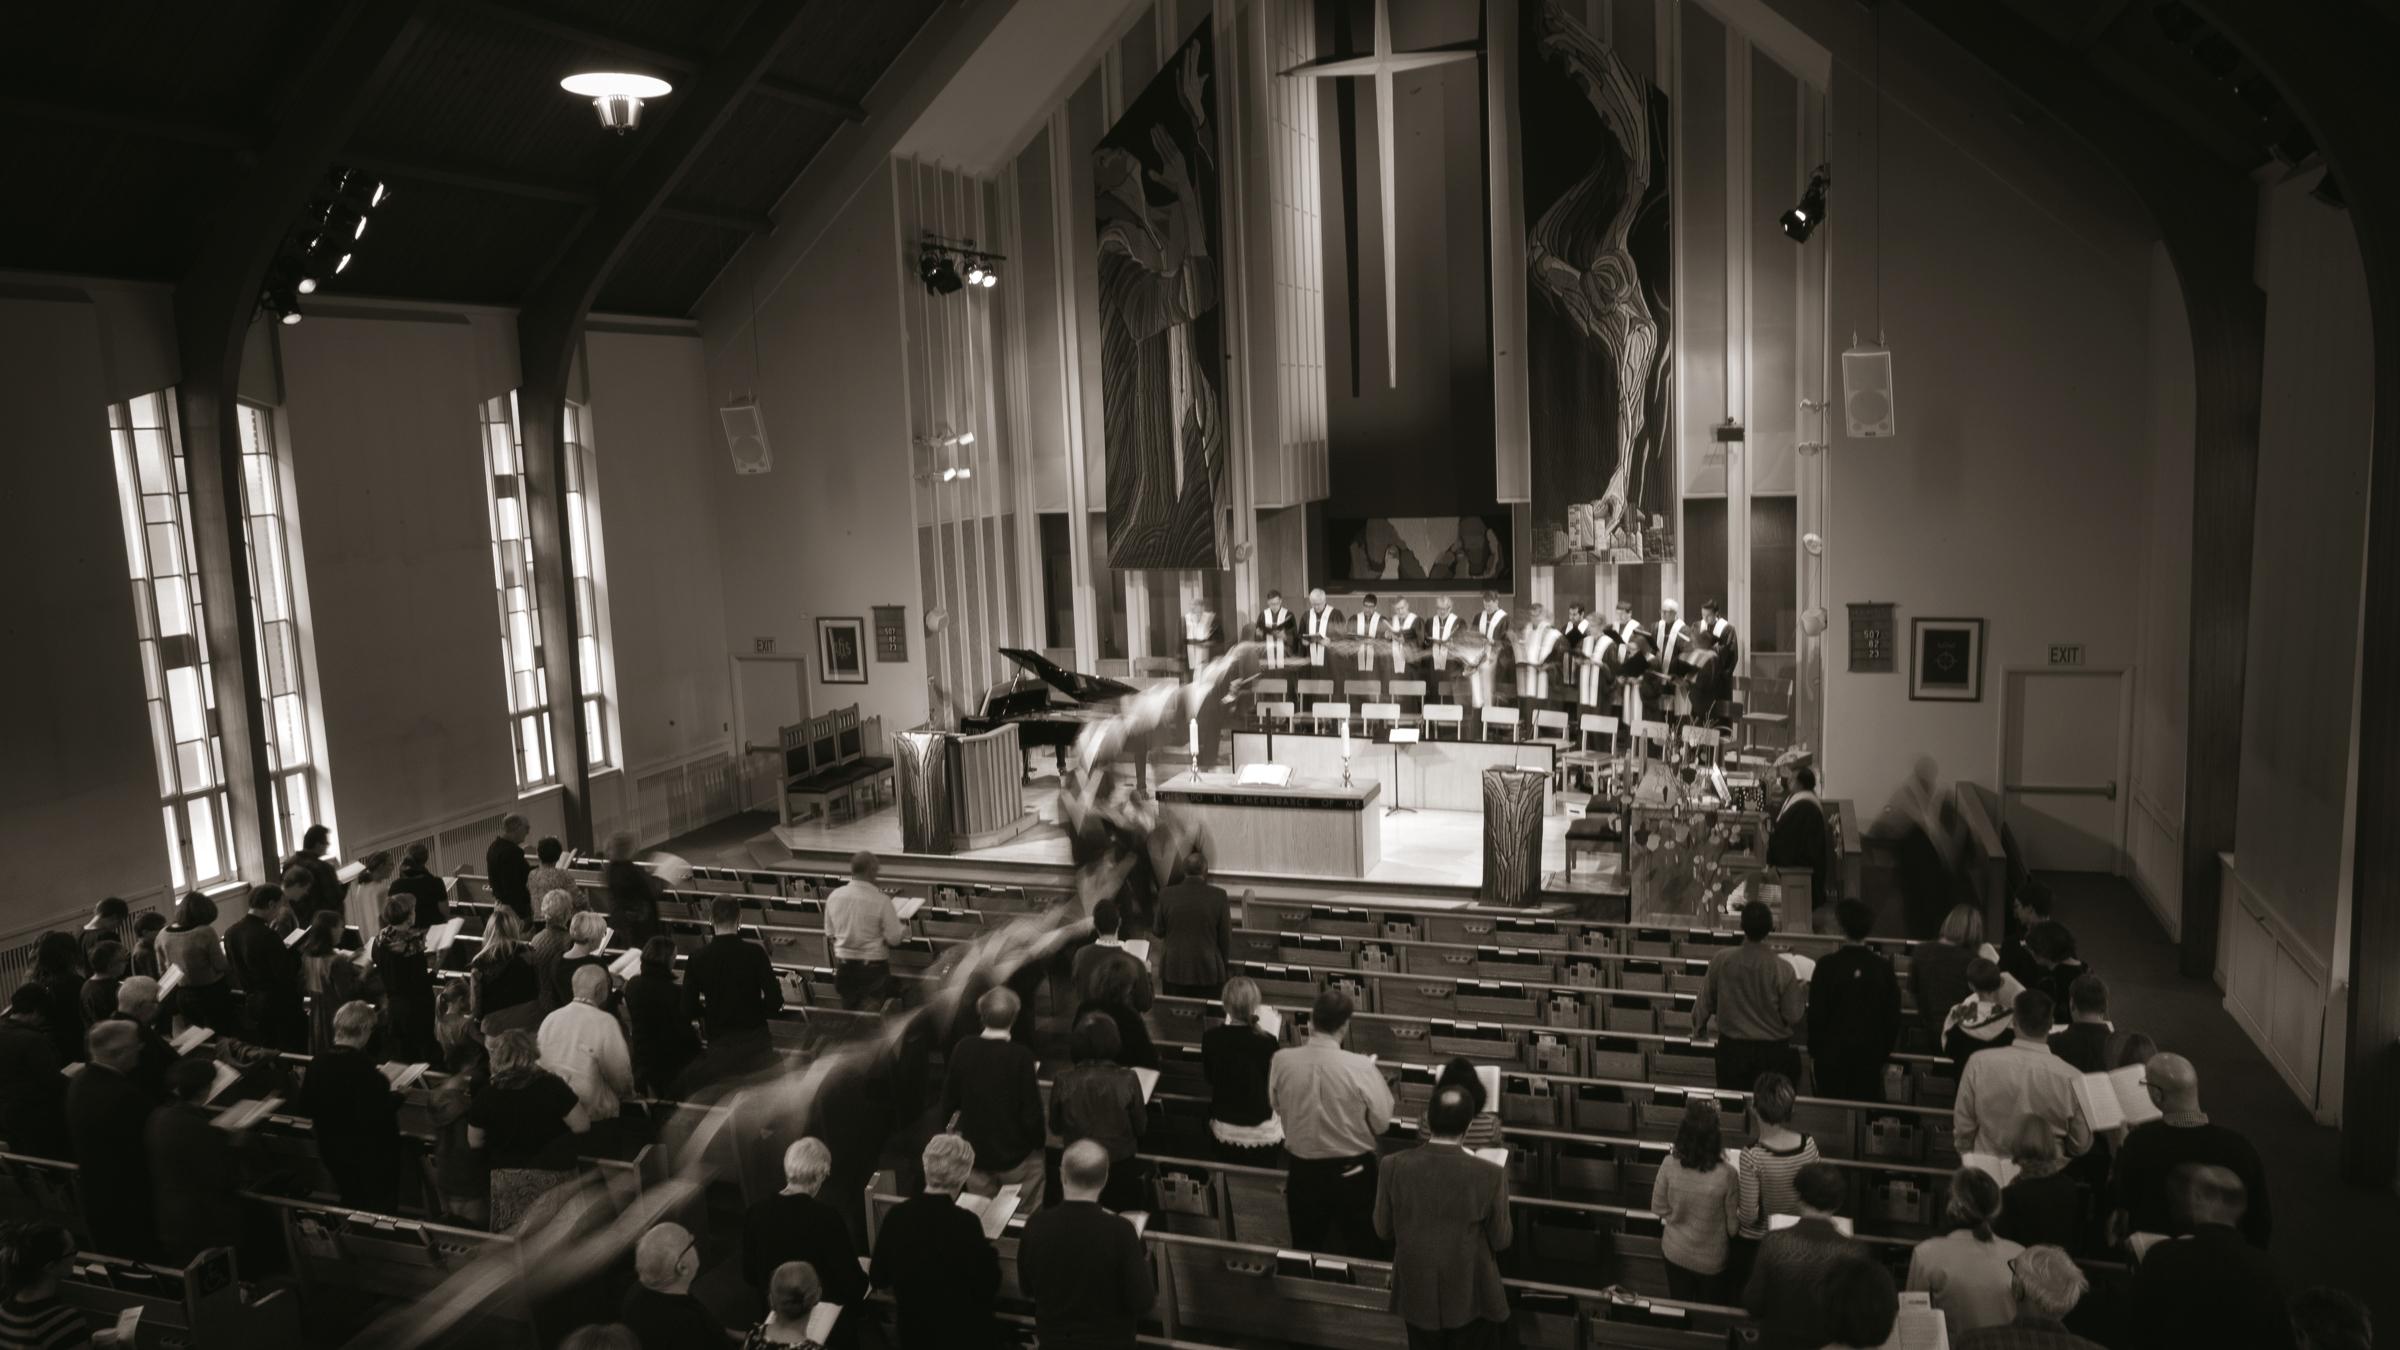 First Baptist Church Edmonton | Seeking the peace and well